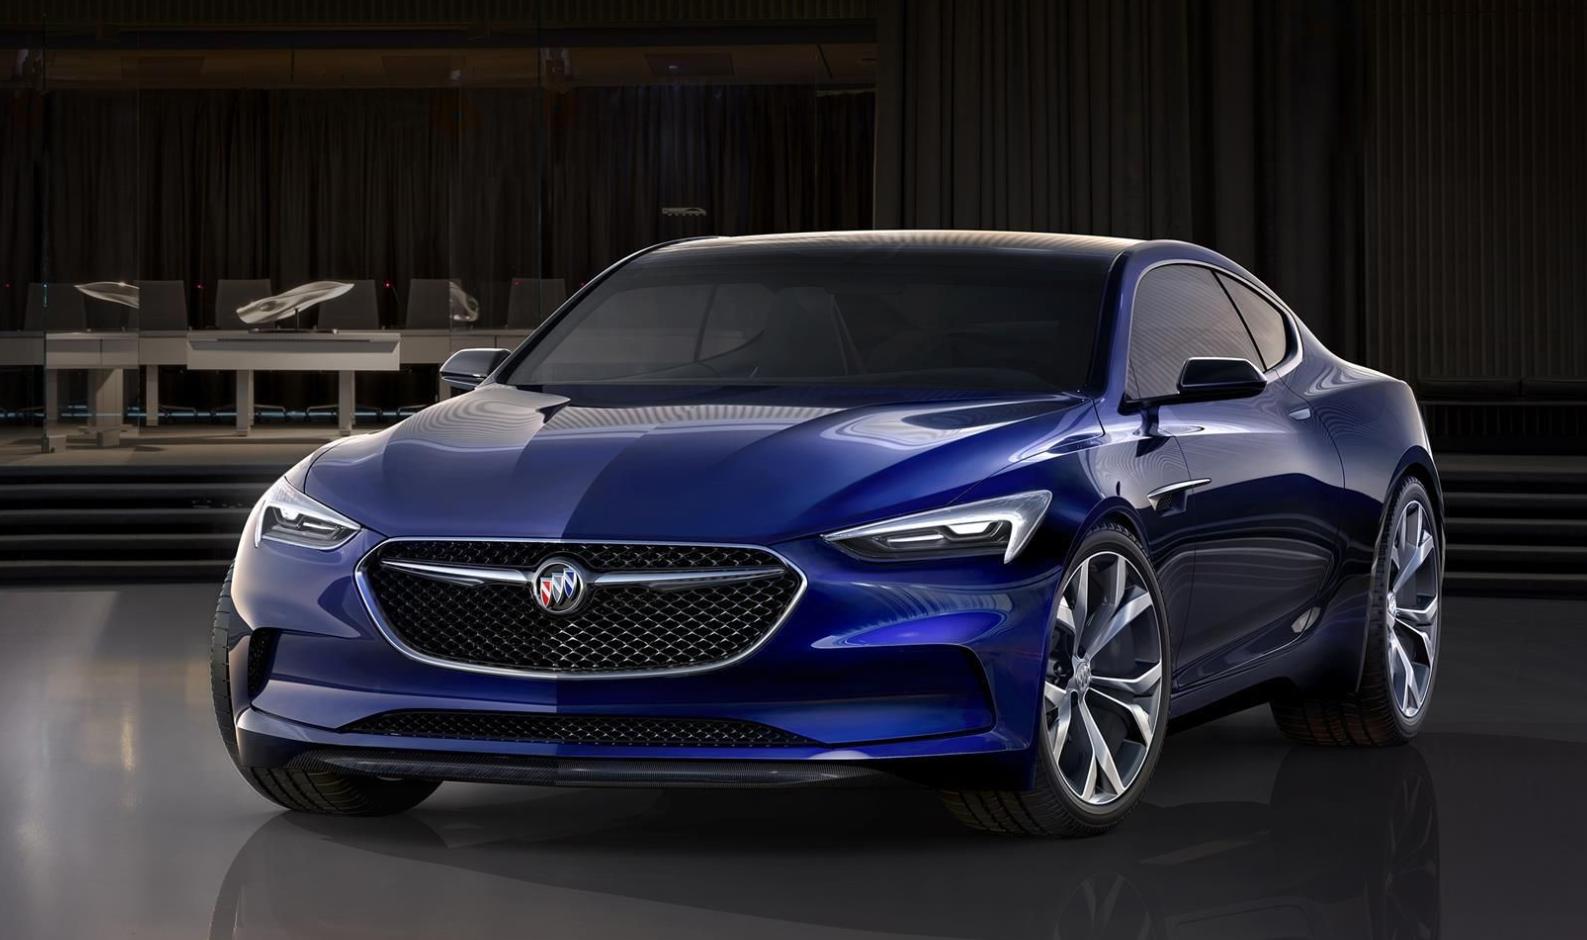 39 Concept of Buick Avista 2020 Concept for Buick Avista 2020